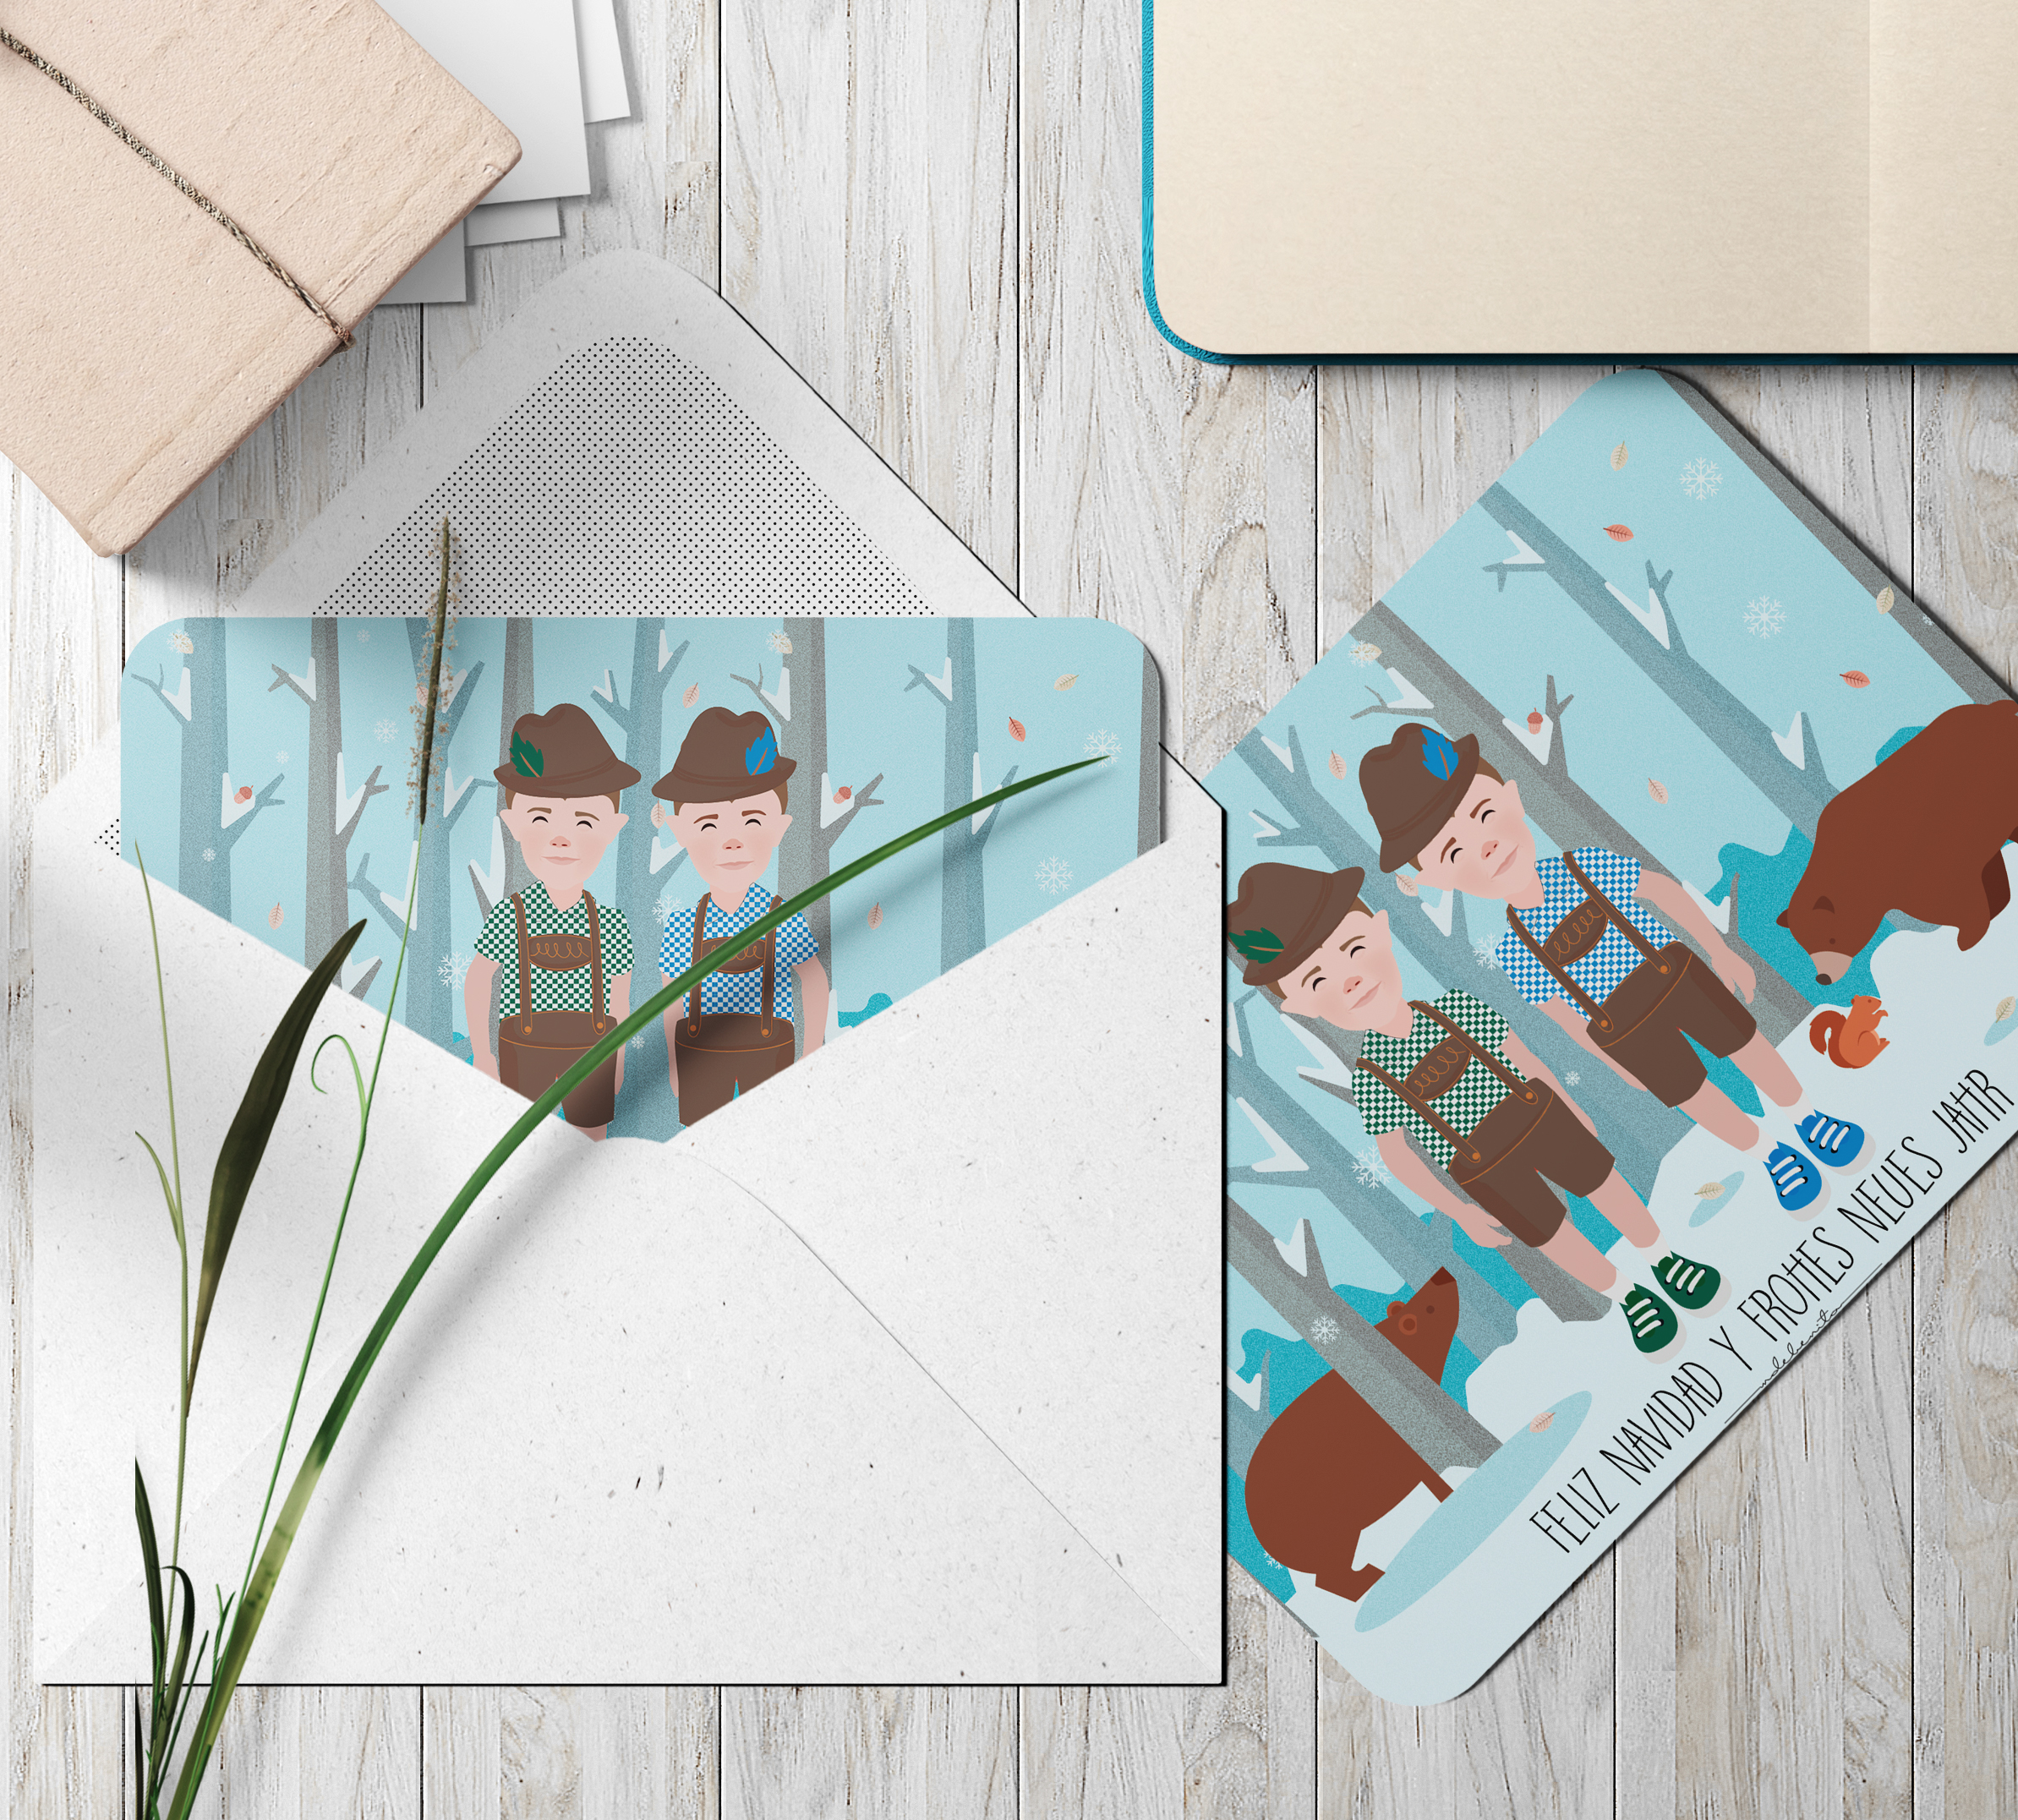 ilustracion-postal-navidad-mdebenito-niños-alemania.jpg